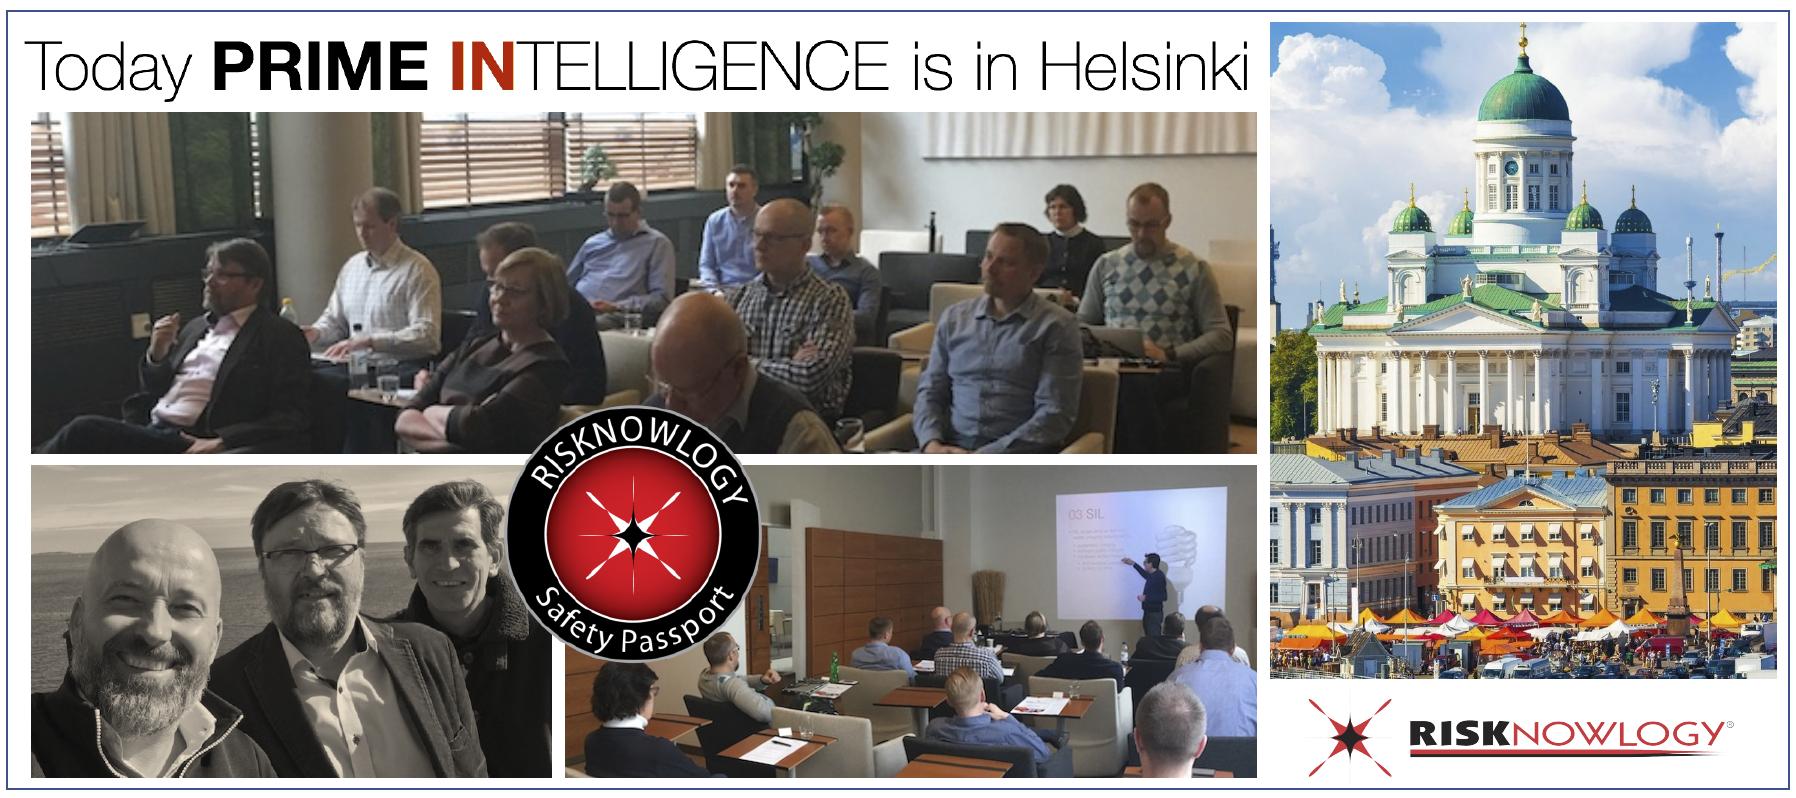 Prime Intelligence Helsinki 8 May 2017